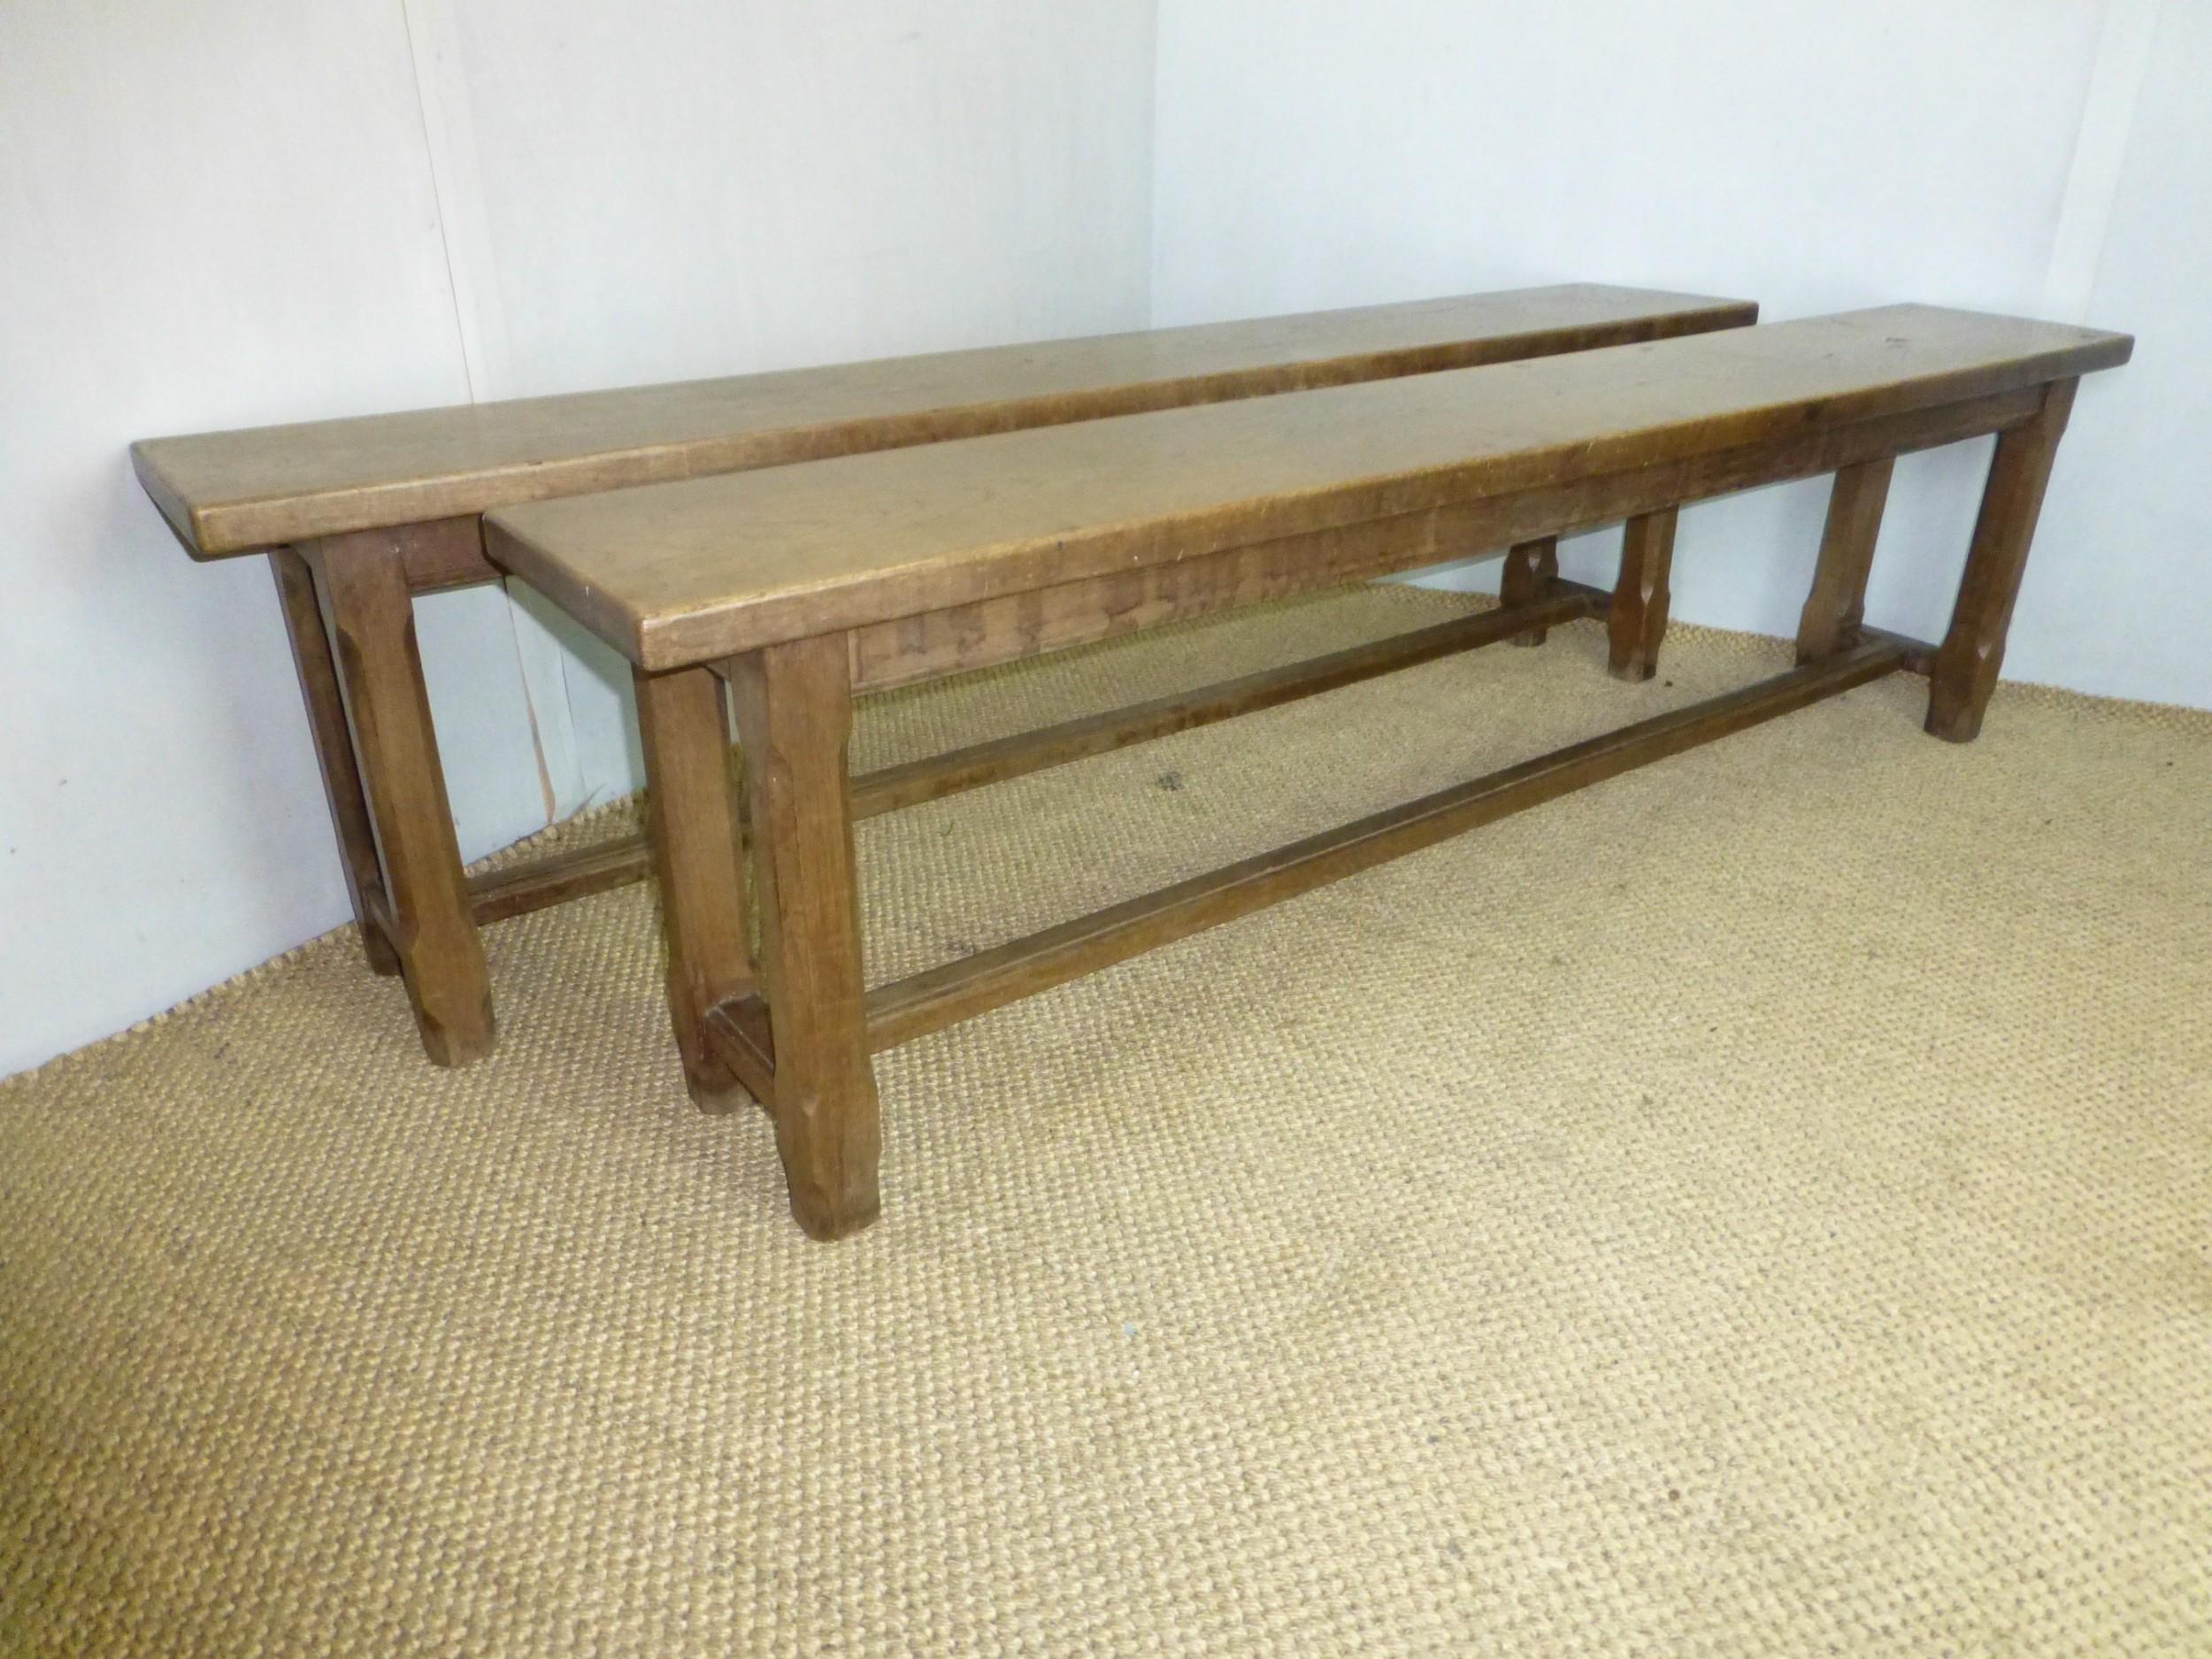 fabulous pair of trestle design 19th century oak benches circa 1870